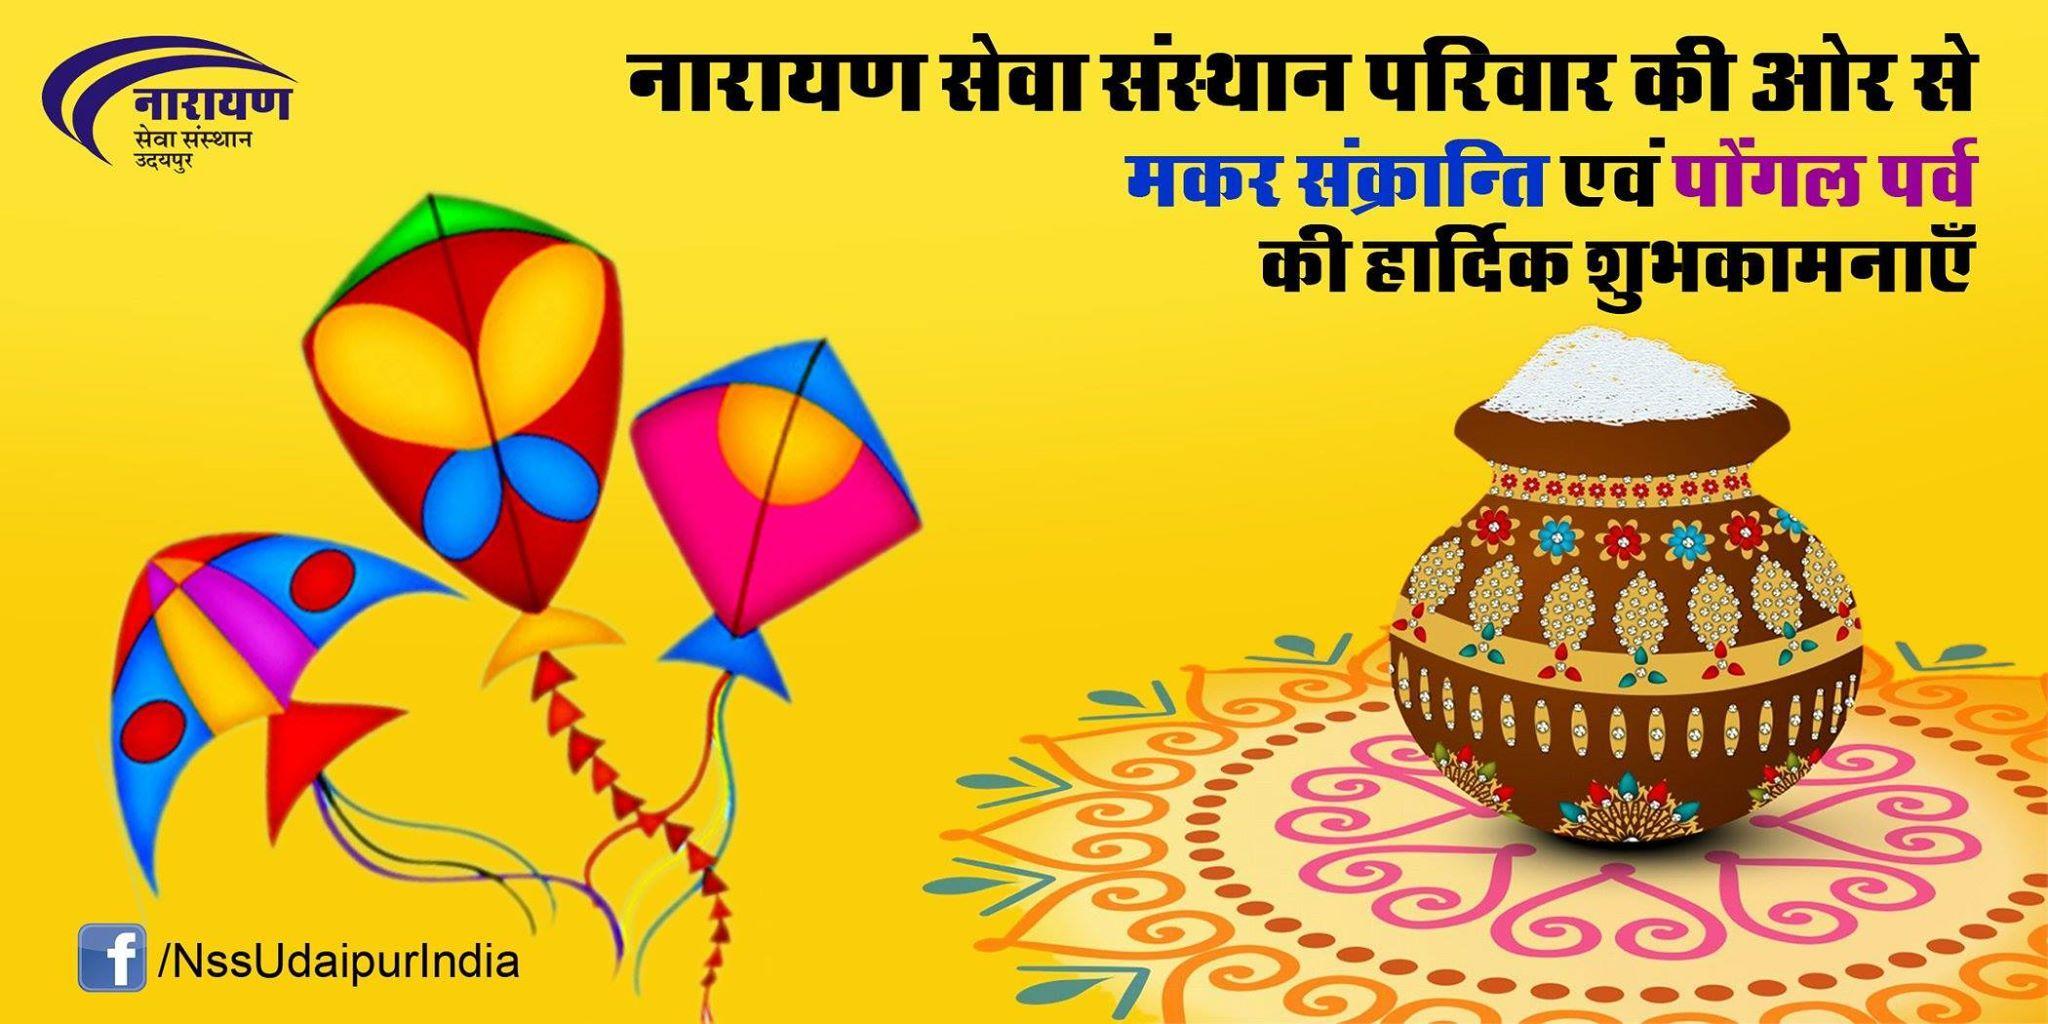 Wish You All Happy Makar Sankranti Pongal Festival And Bihu Www